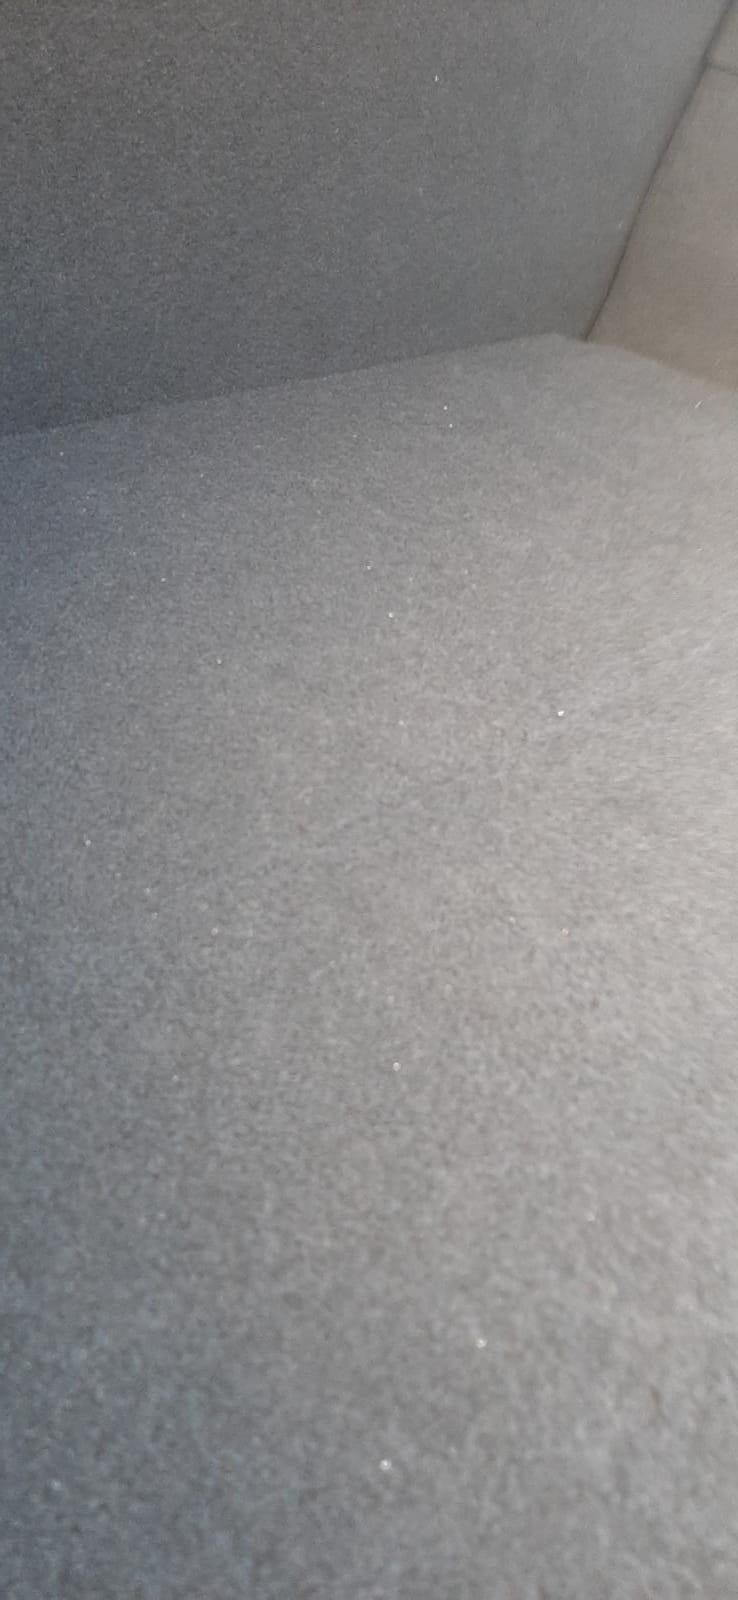 7896db53781e9bf-ca2f-49a3-b8be-7c8ff69fa628.jpg